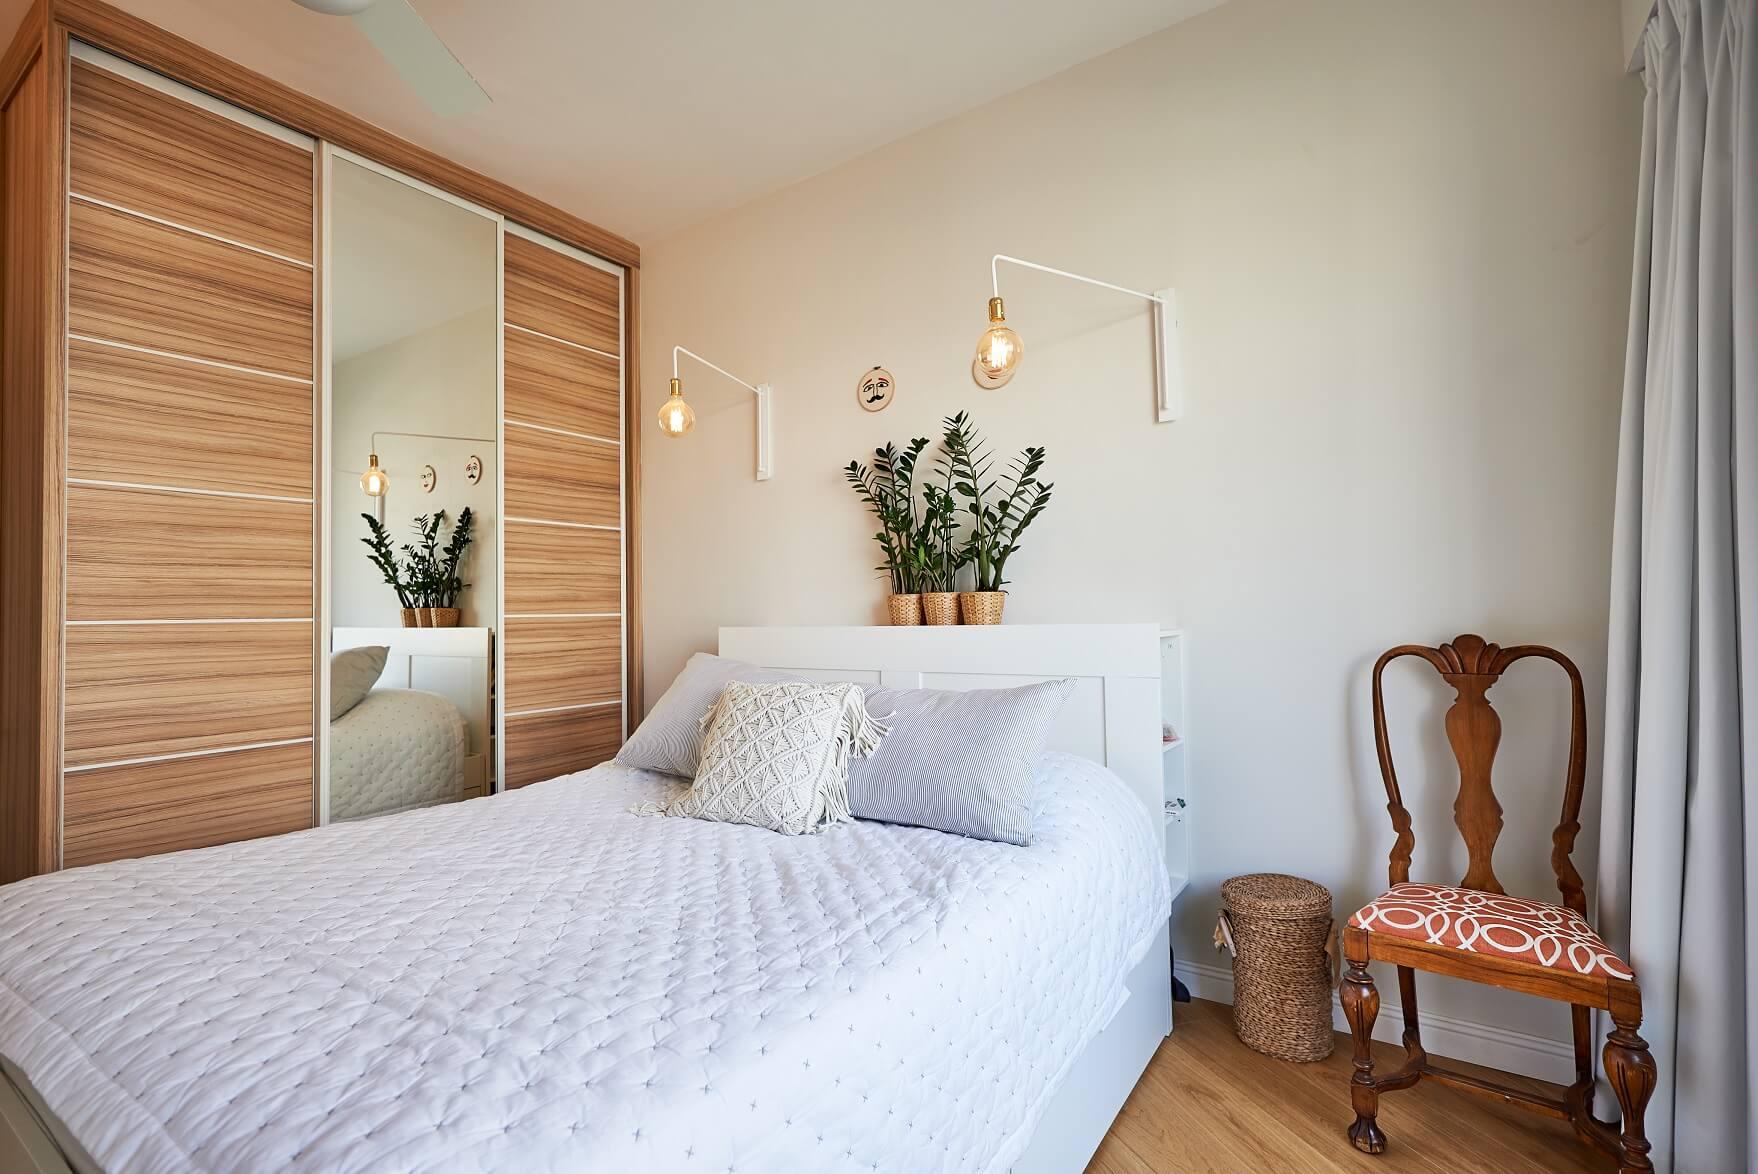 חדר השינה, עיצוב טל מידן, צילום: סיגל סבן